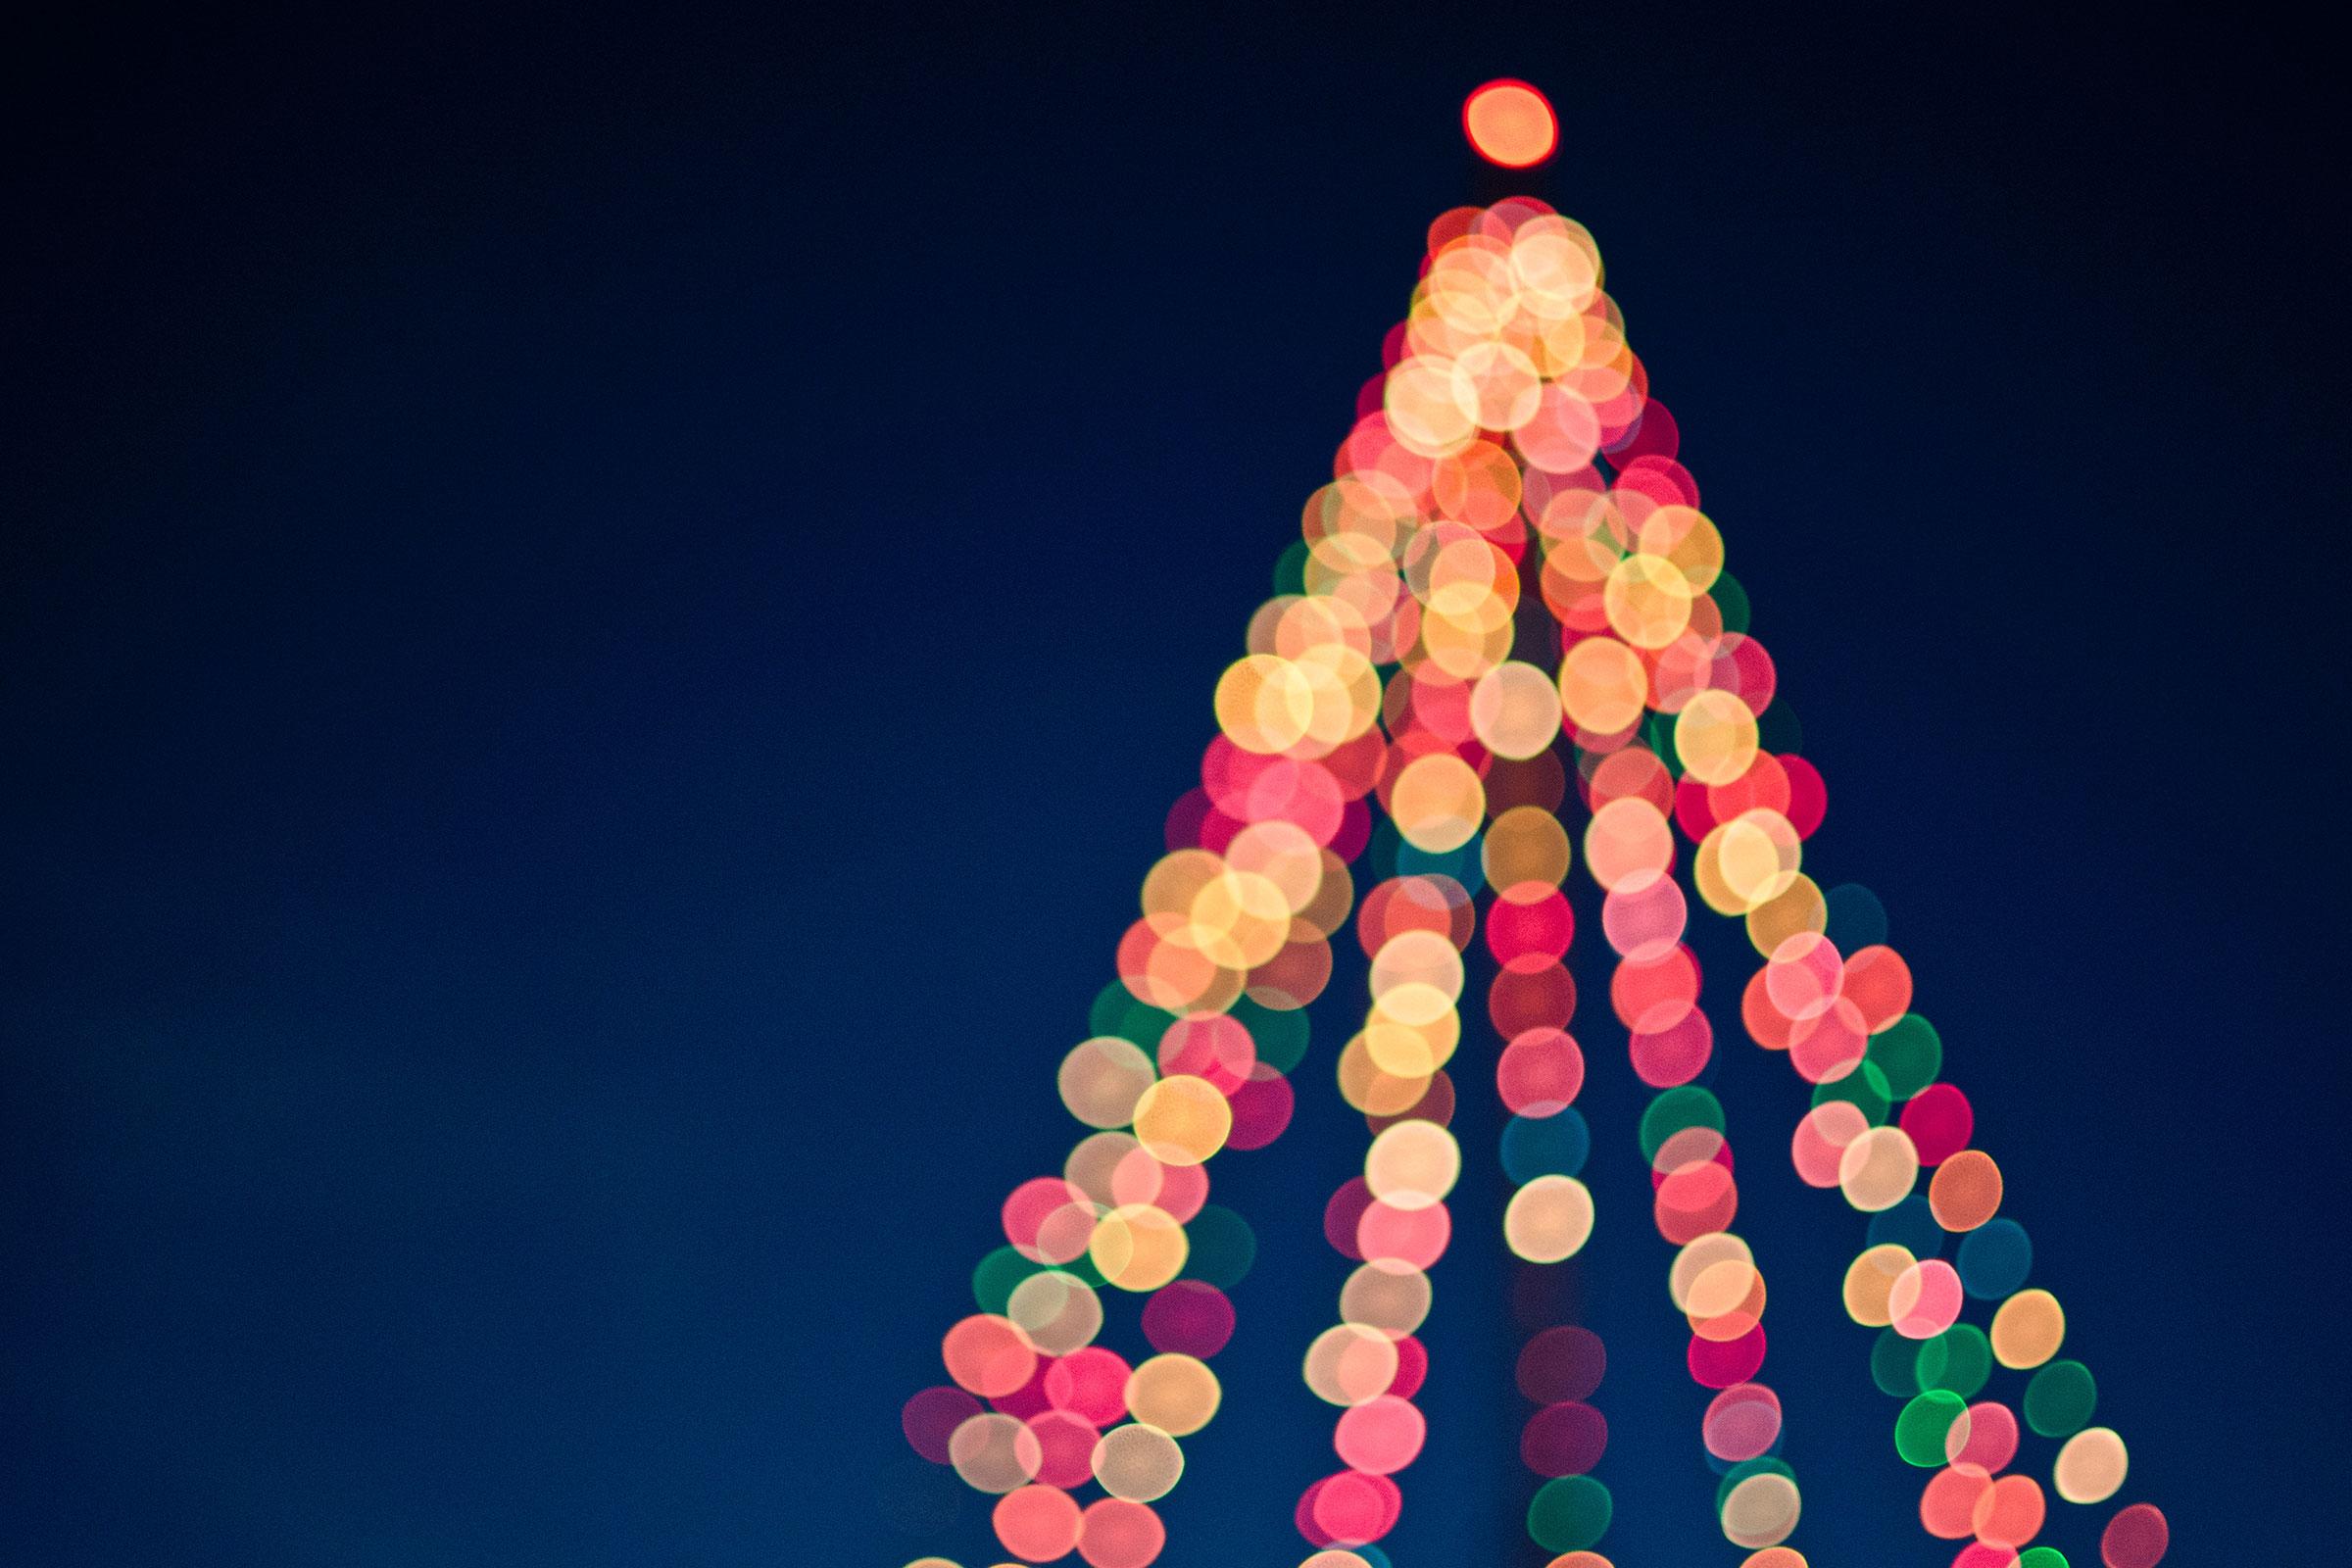 NMBx Mix holiday lights